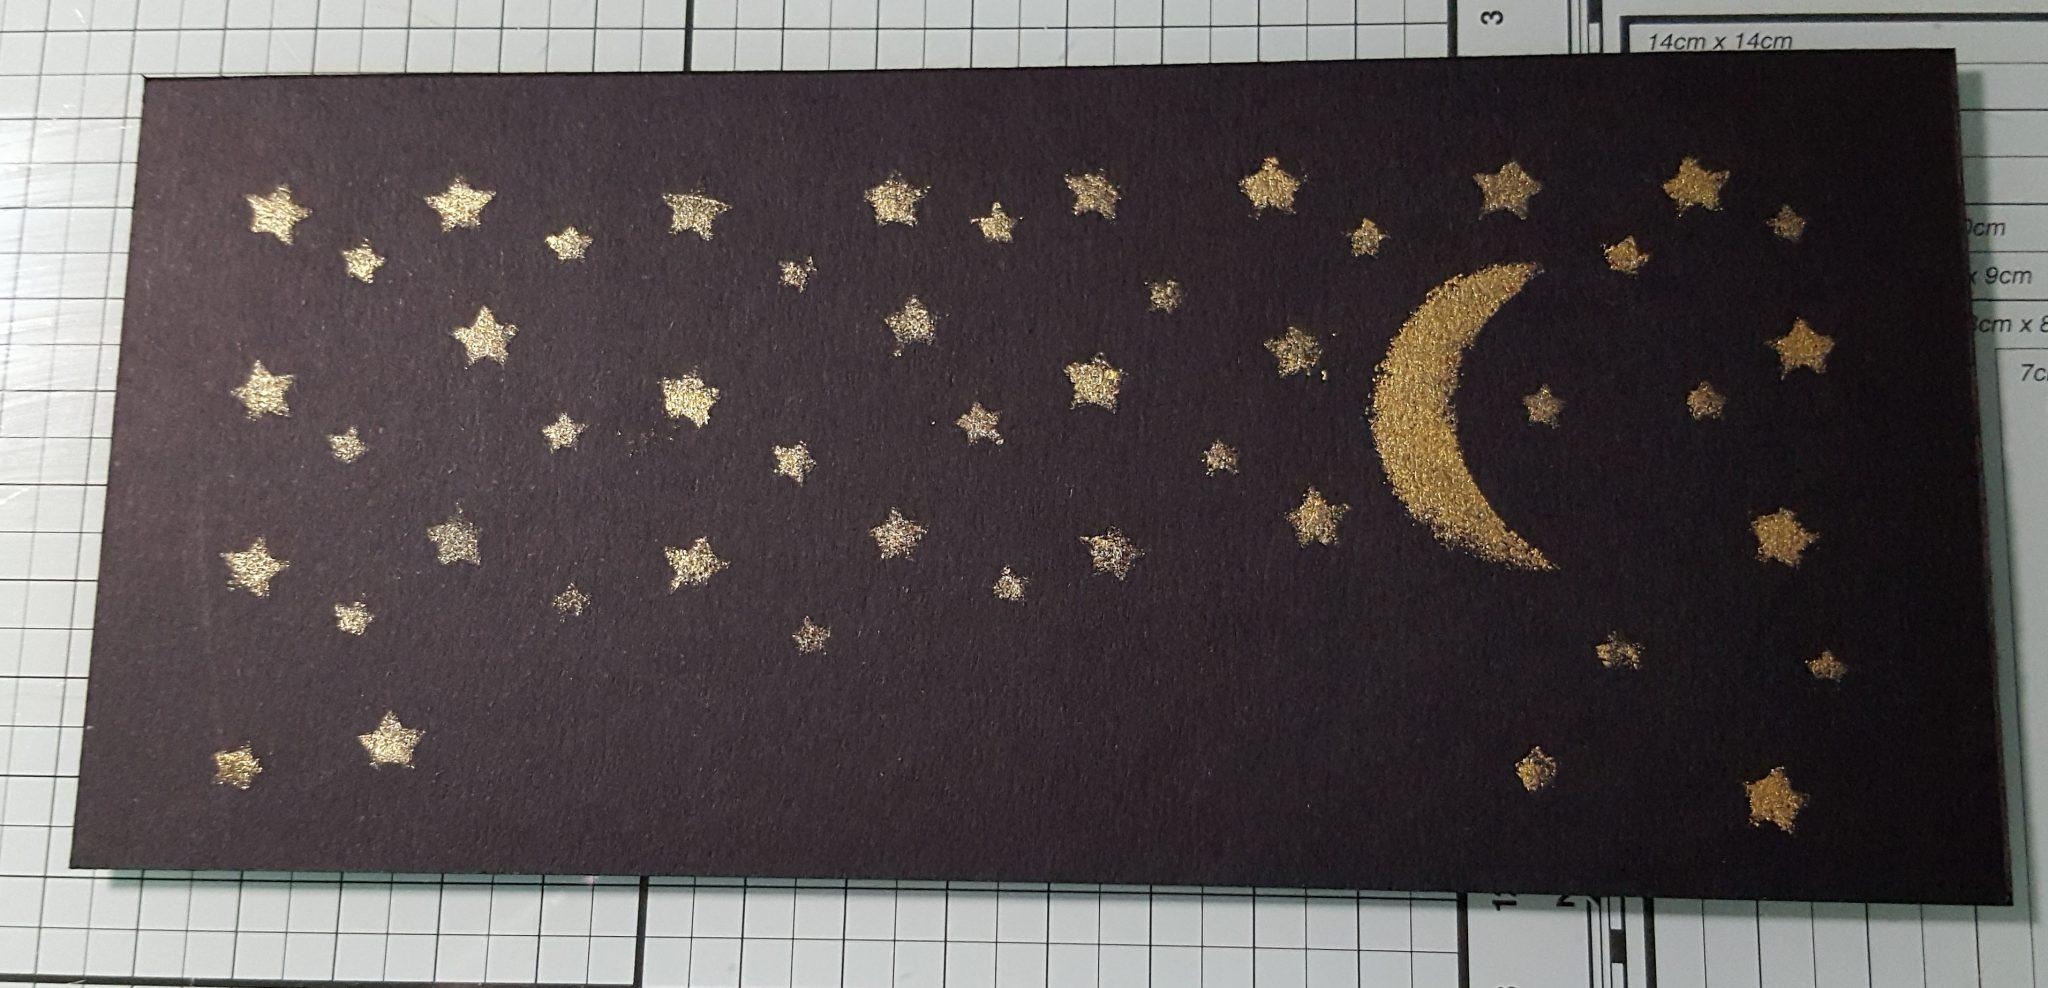 Starry Night Glittering Stars